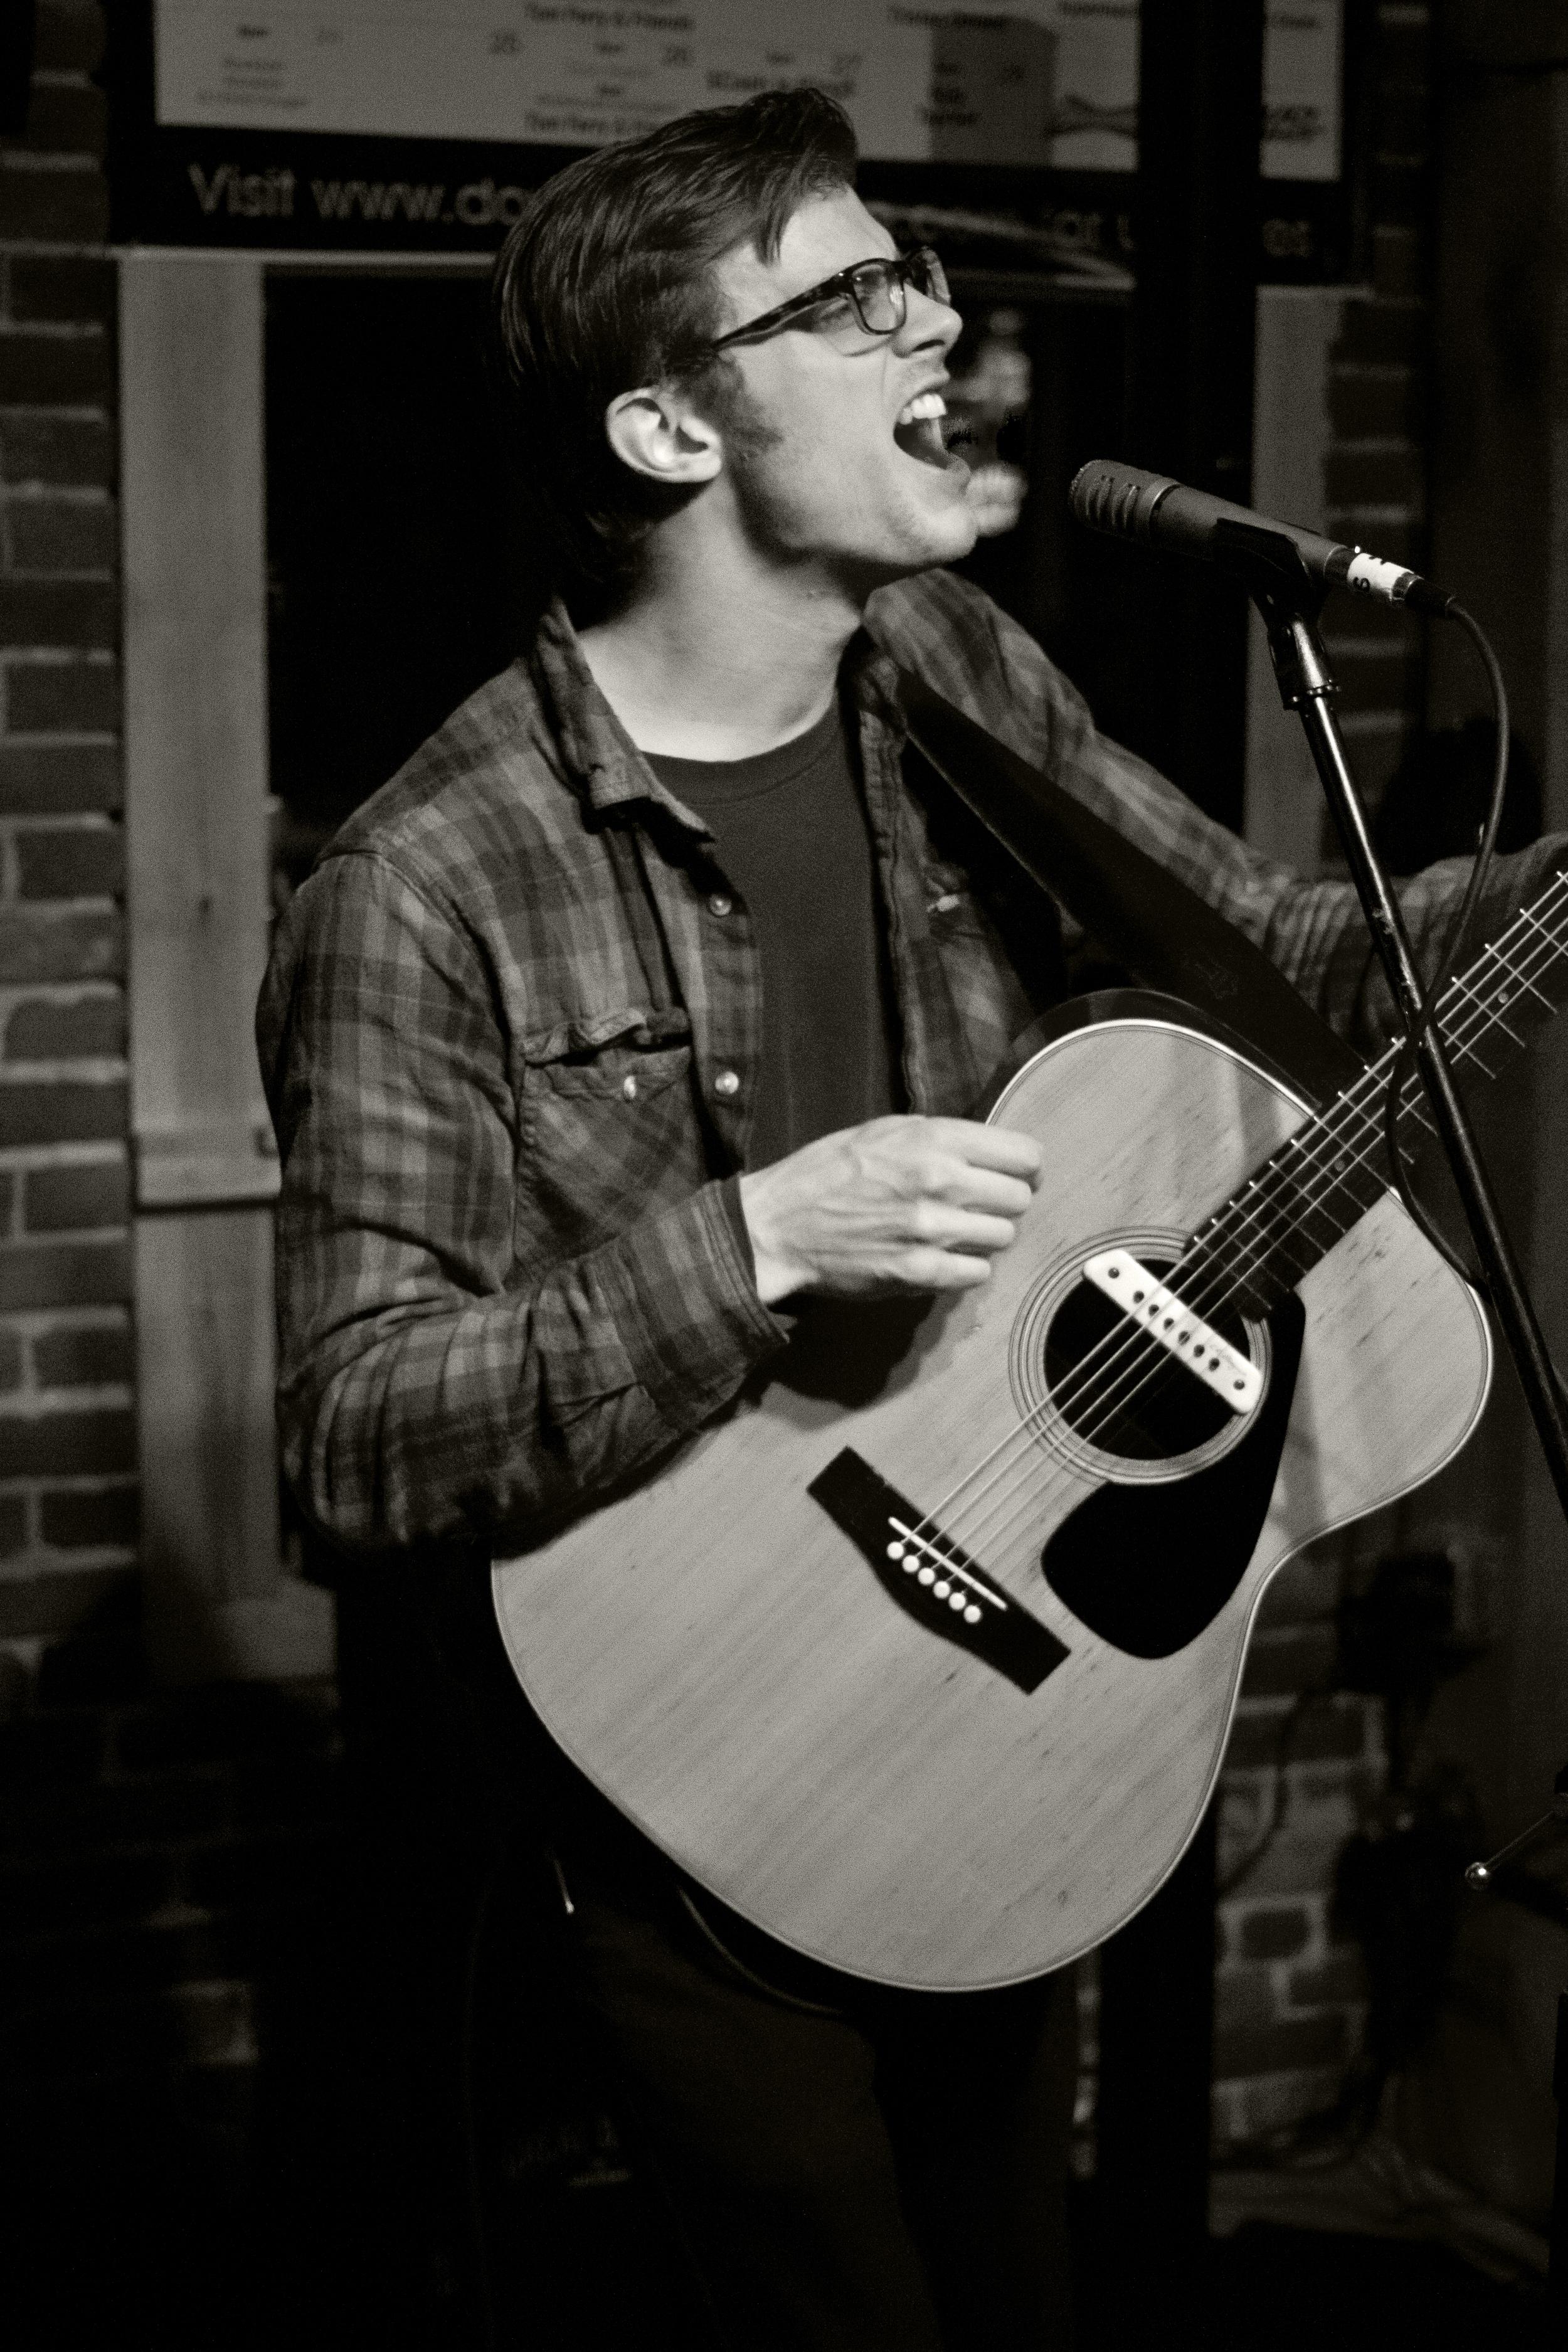 Singer/Songwriter Tristan Omand